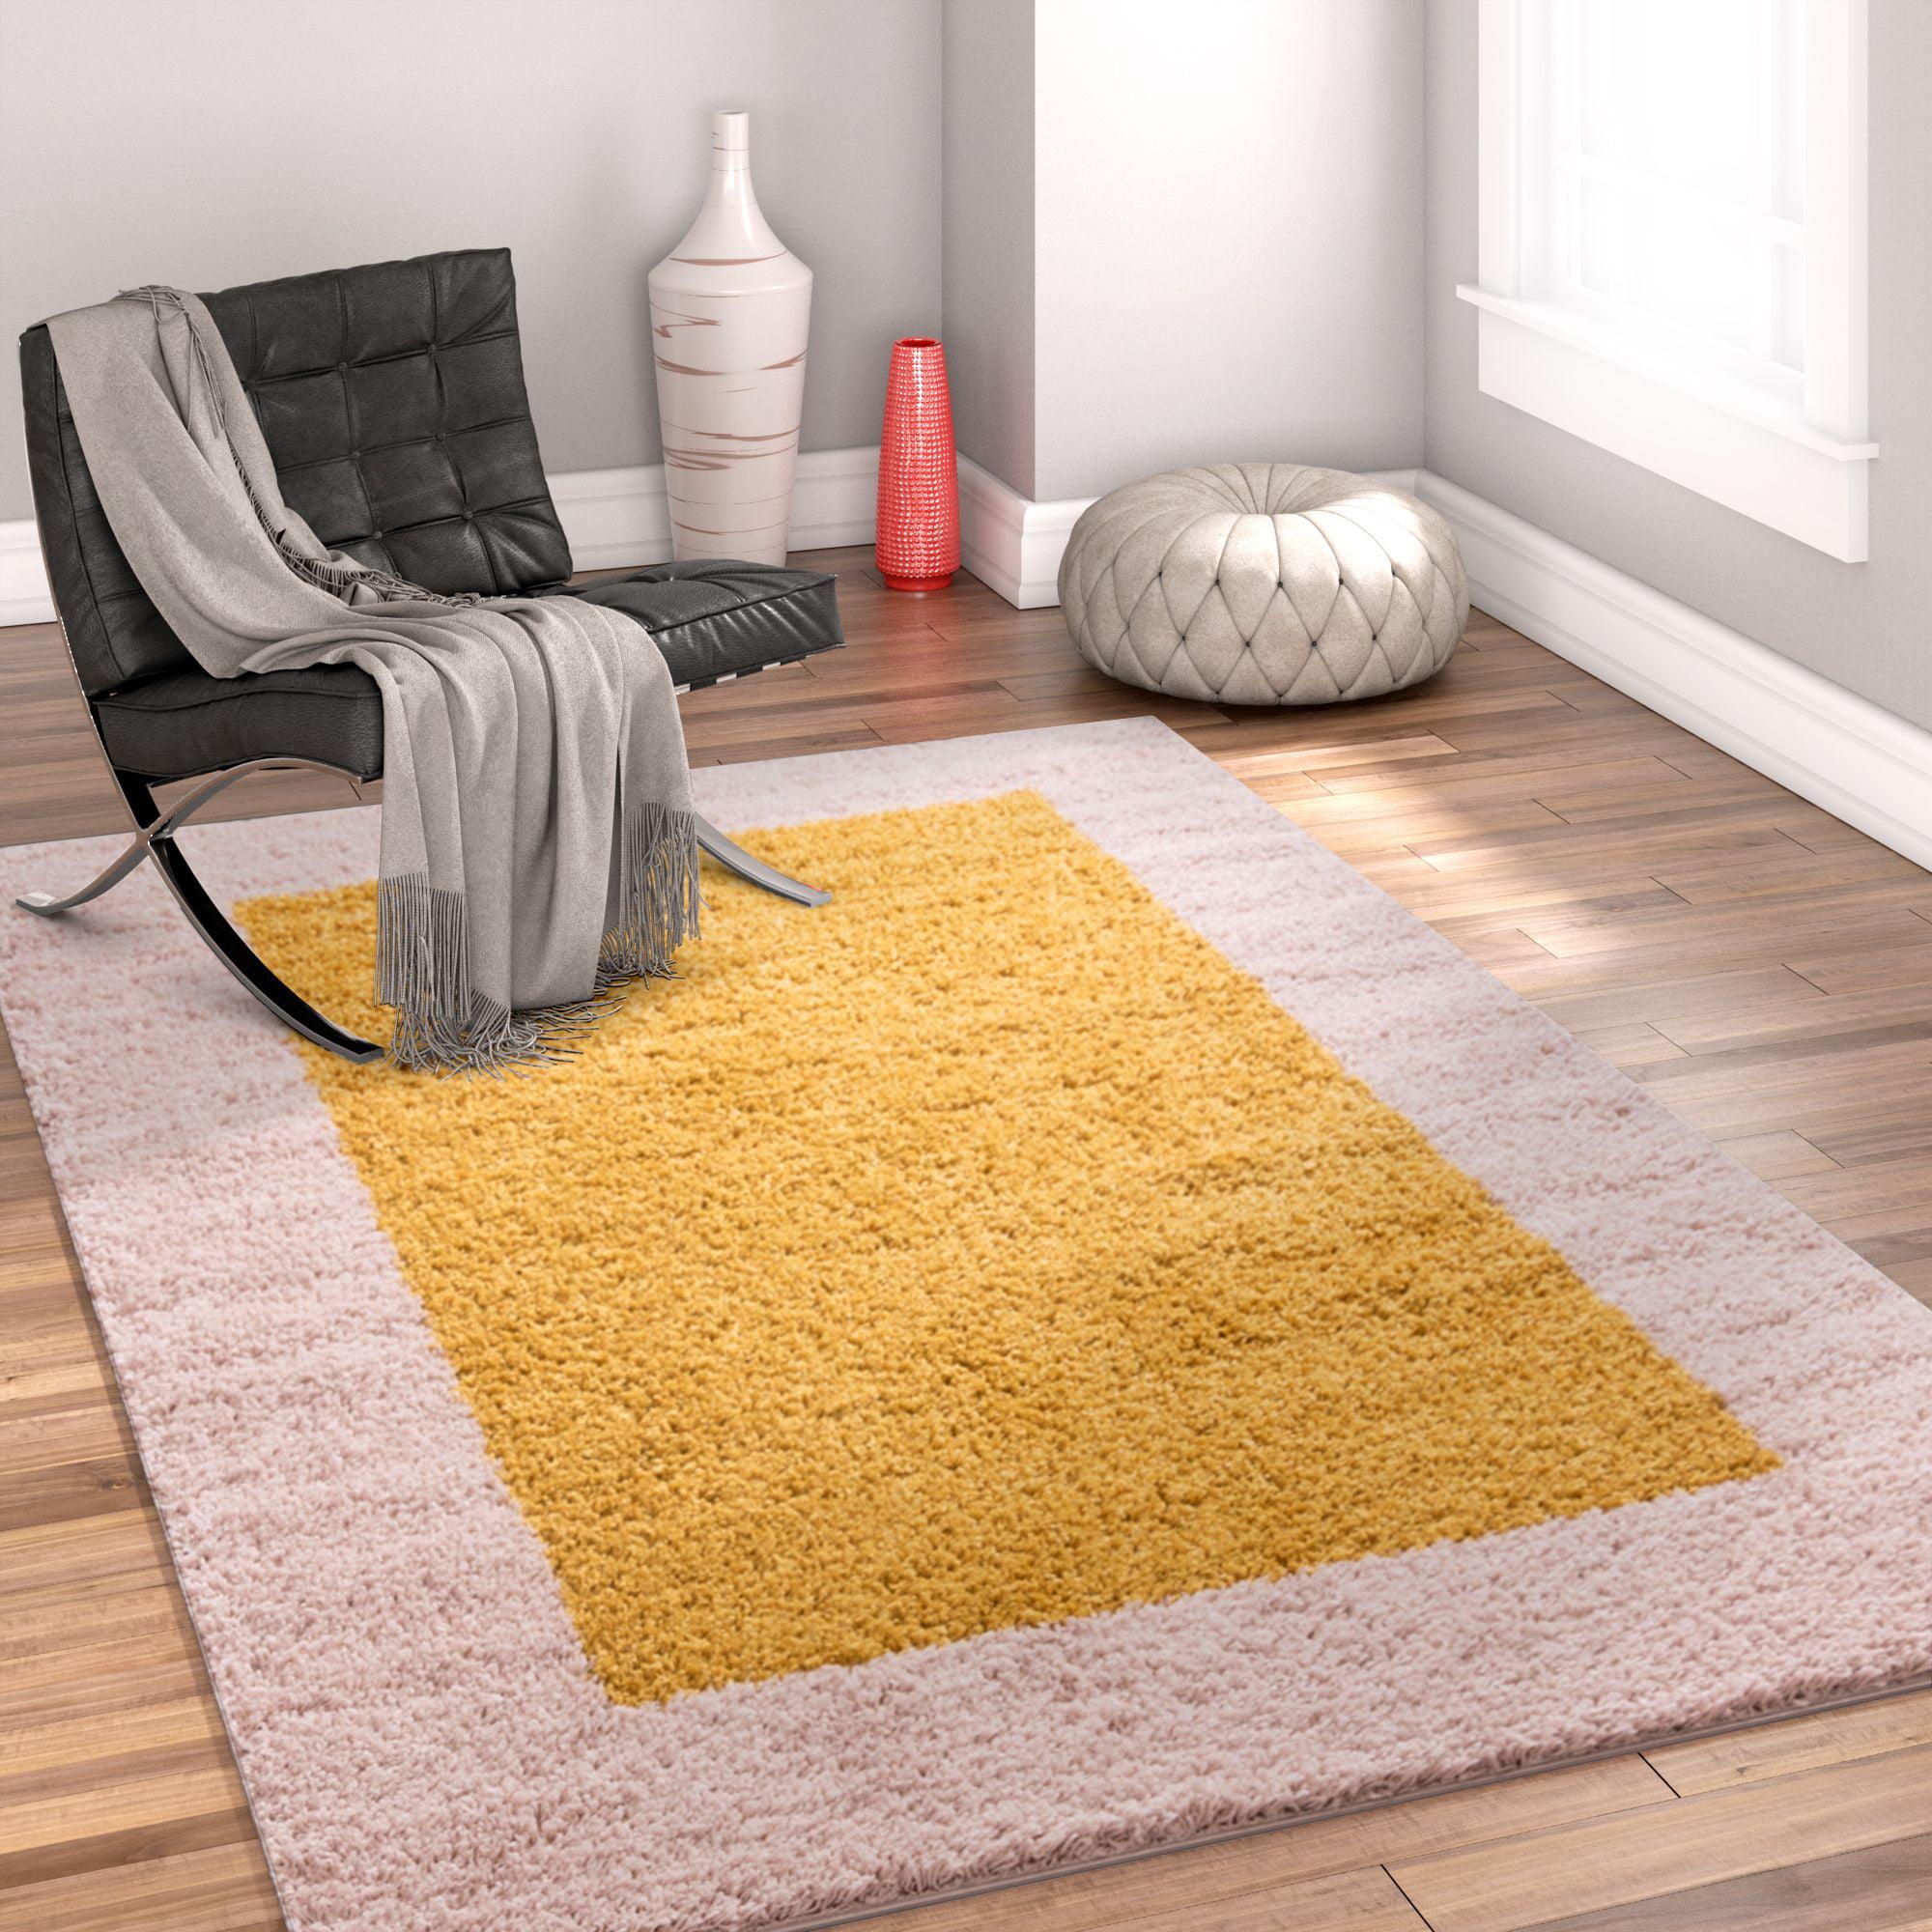 Porta Border Modern Geometric Shag 3x5 (3'3'' x 5'3'') Area Rug Gold Beige Plush Easy Care Thick Soft Plush Living Room